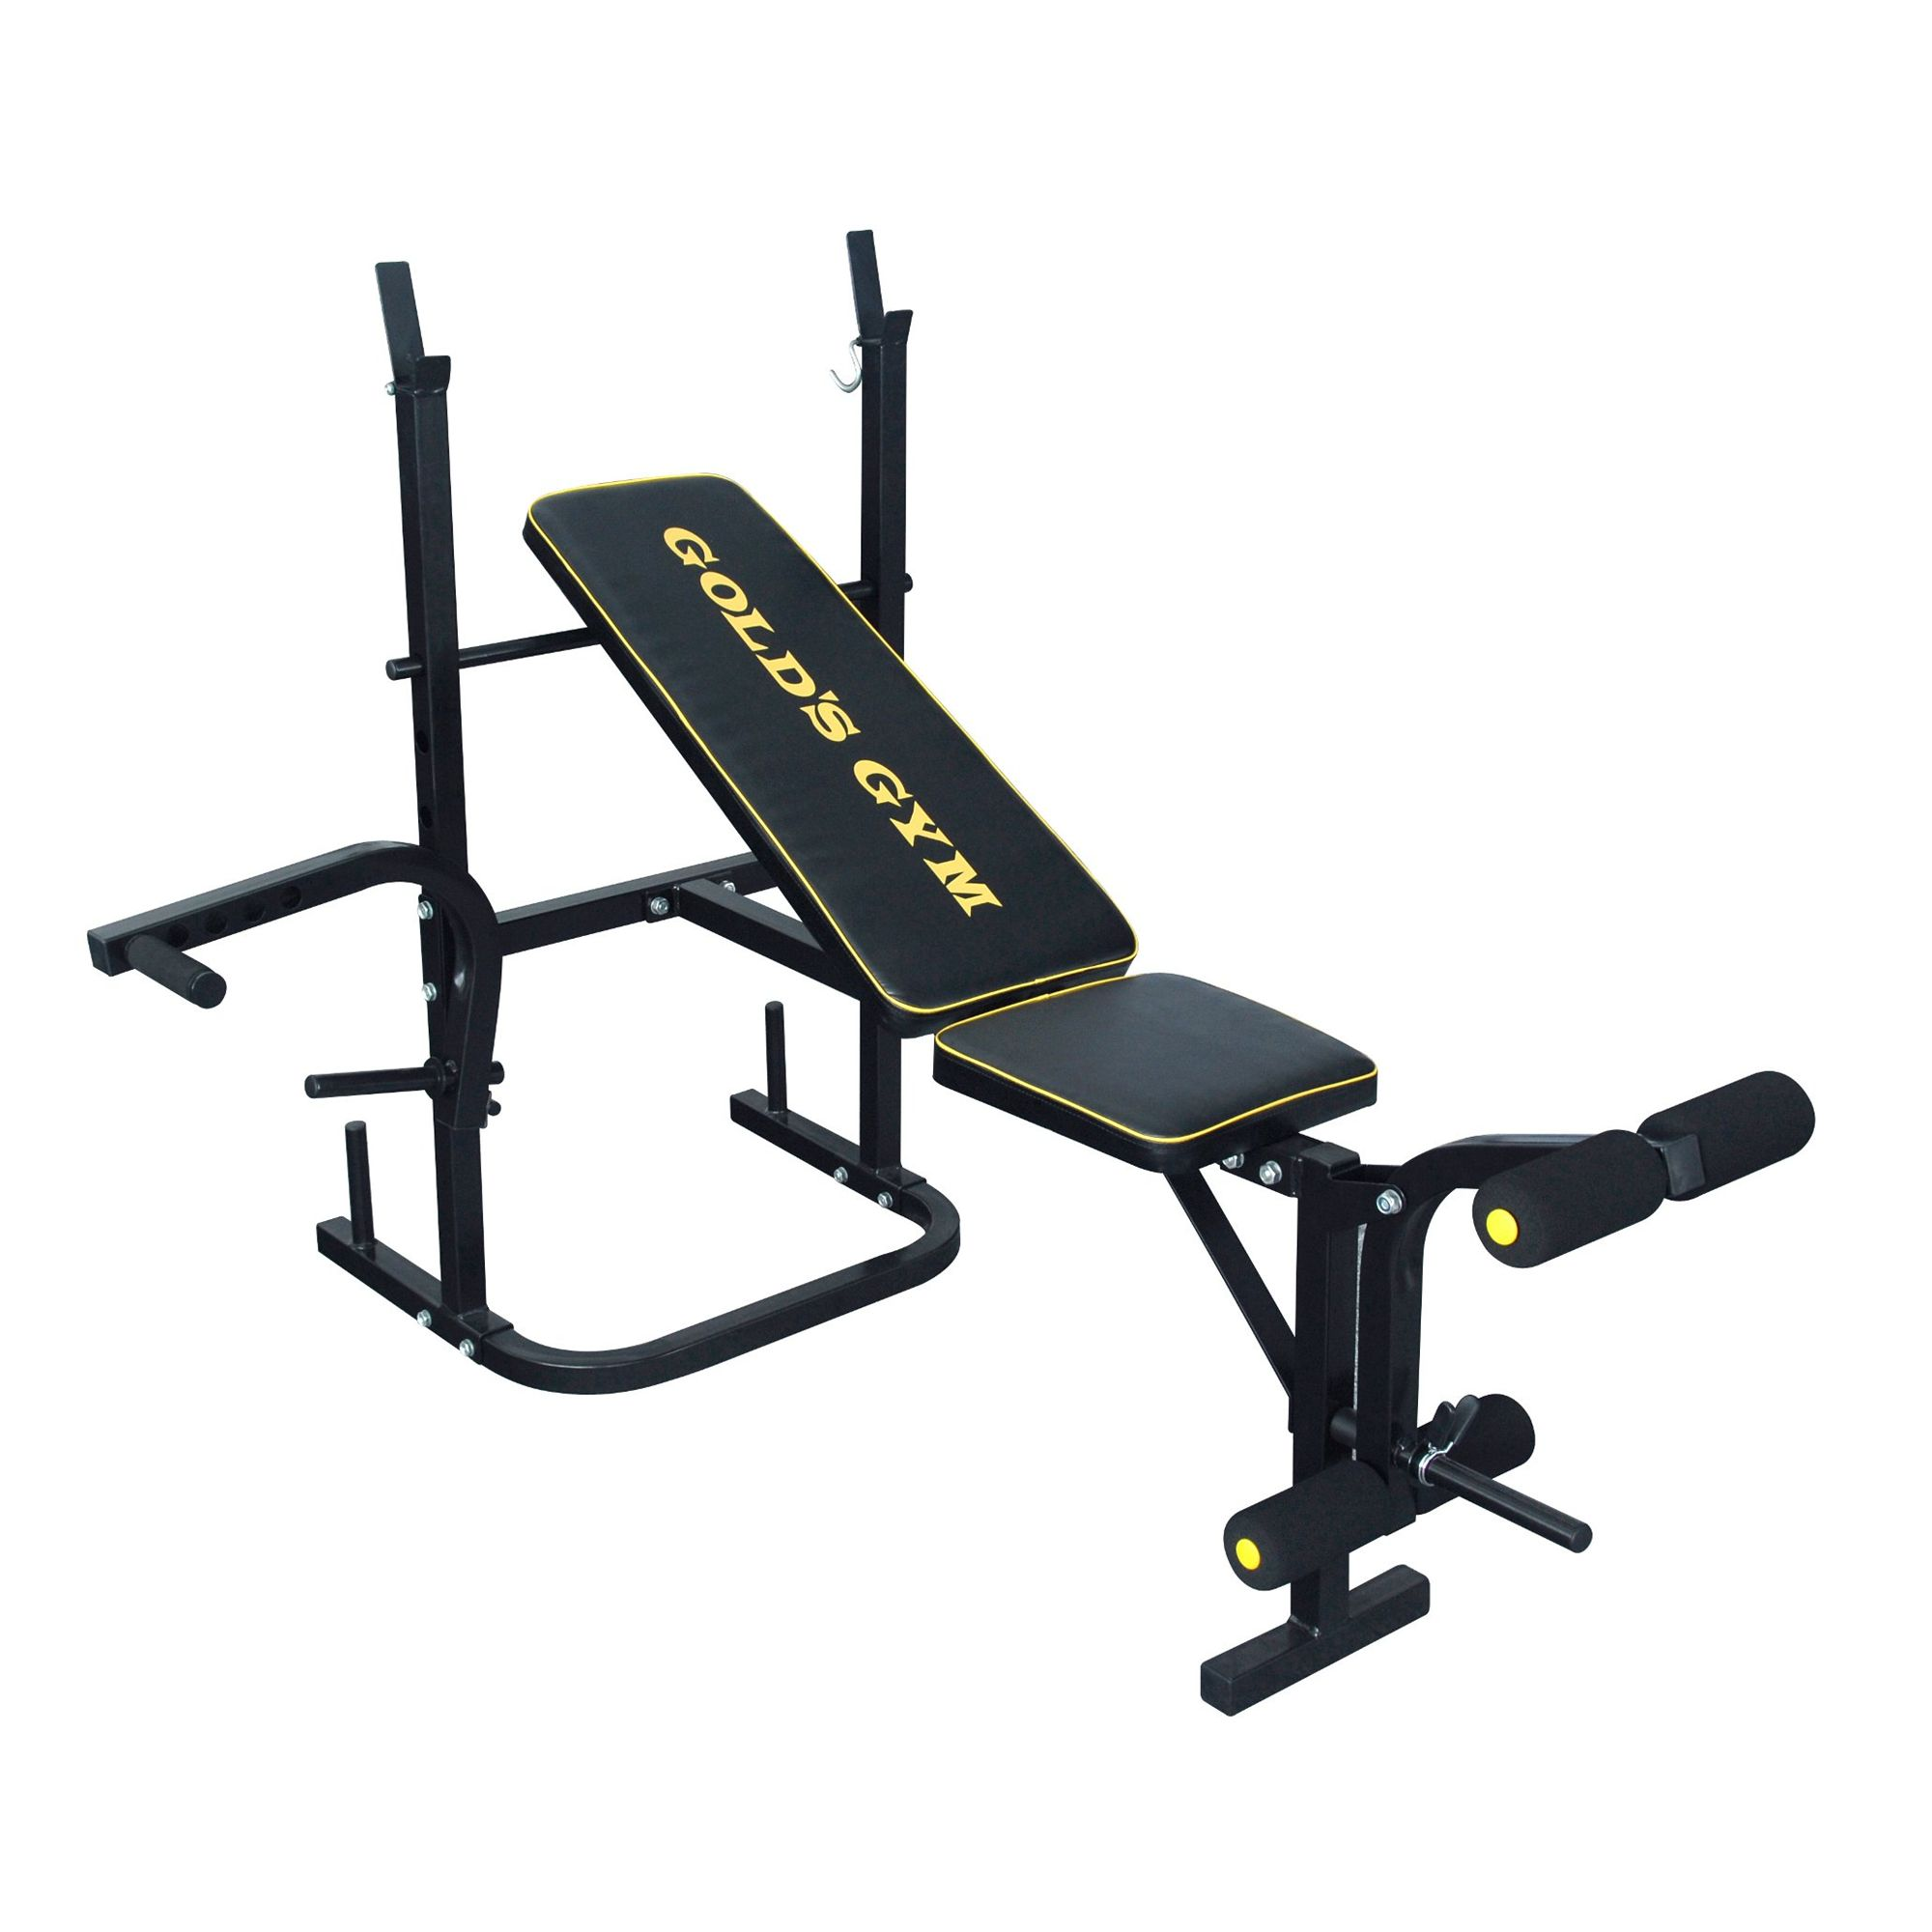 Golds Gym Multi Purpose Bench - Sweatband.com